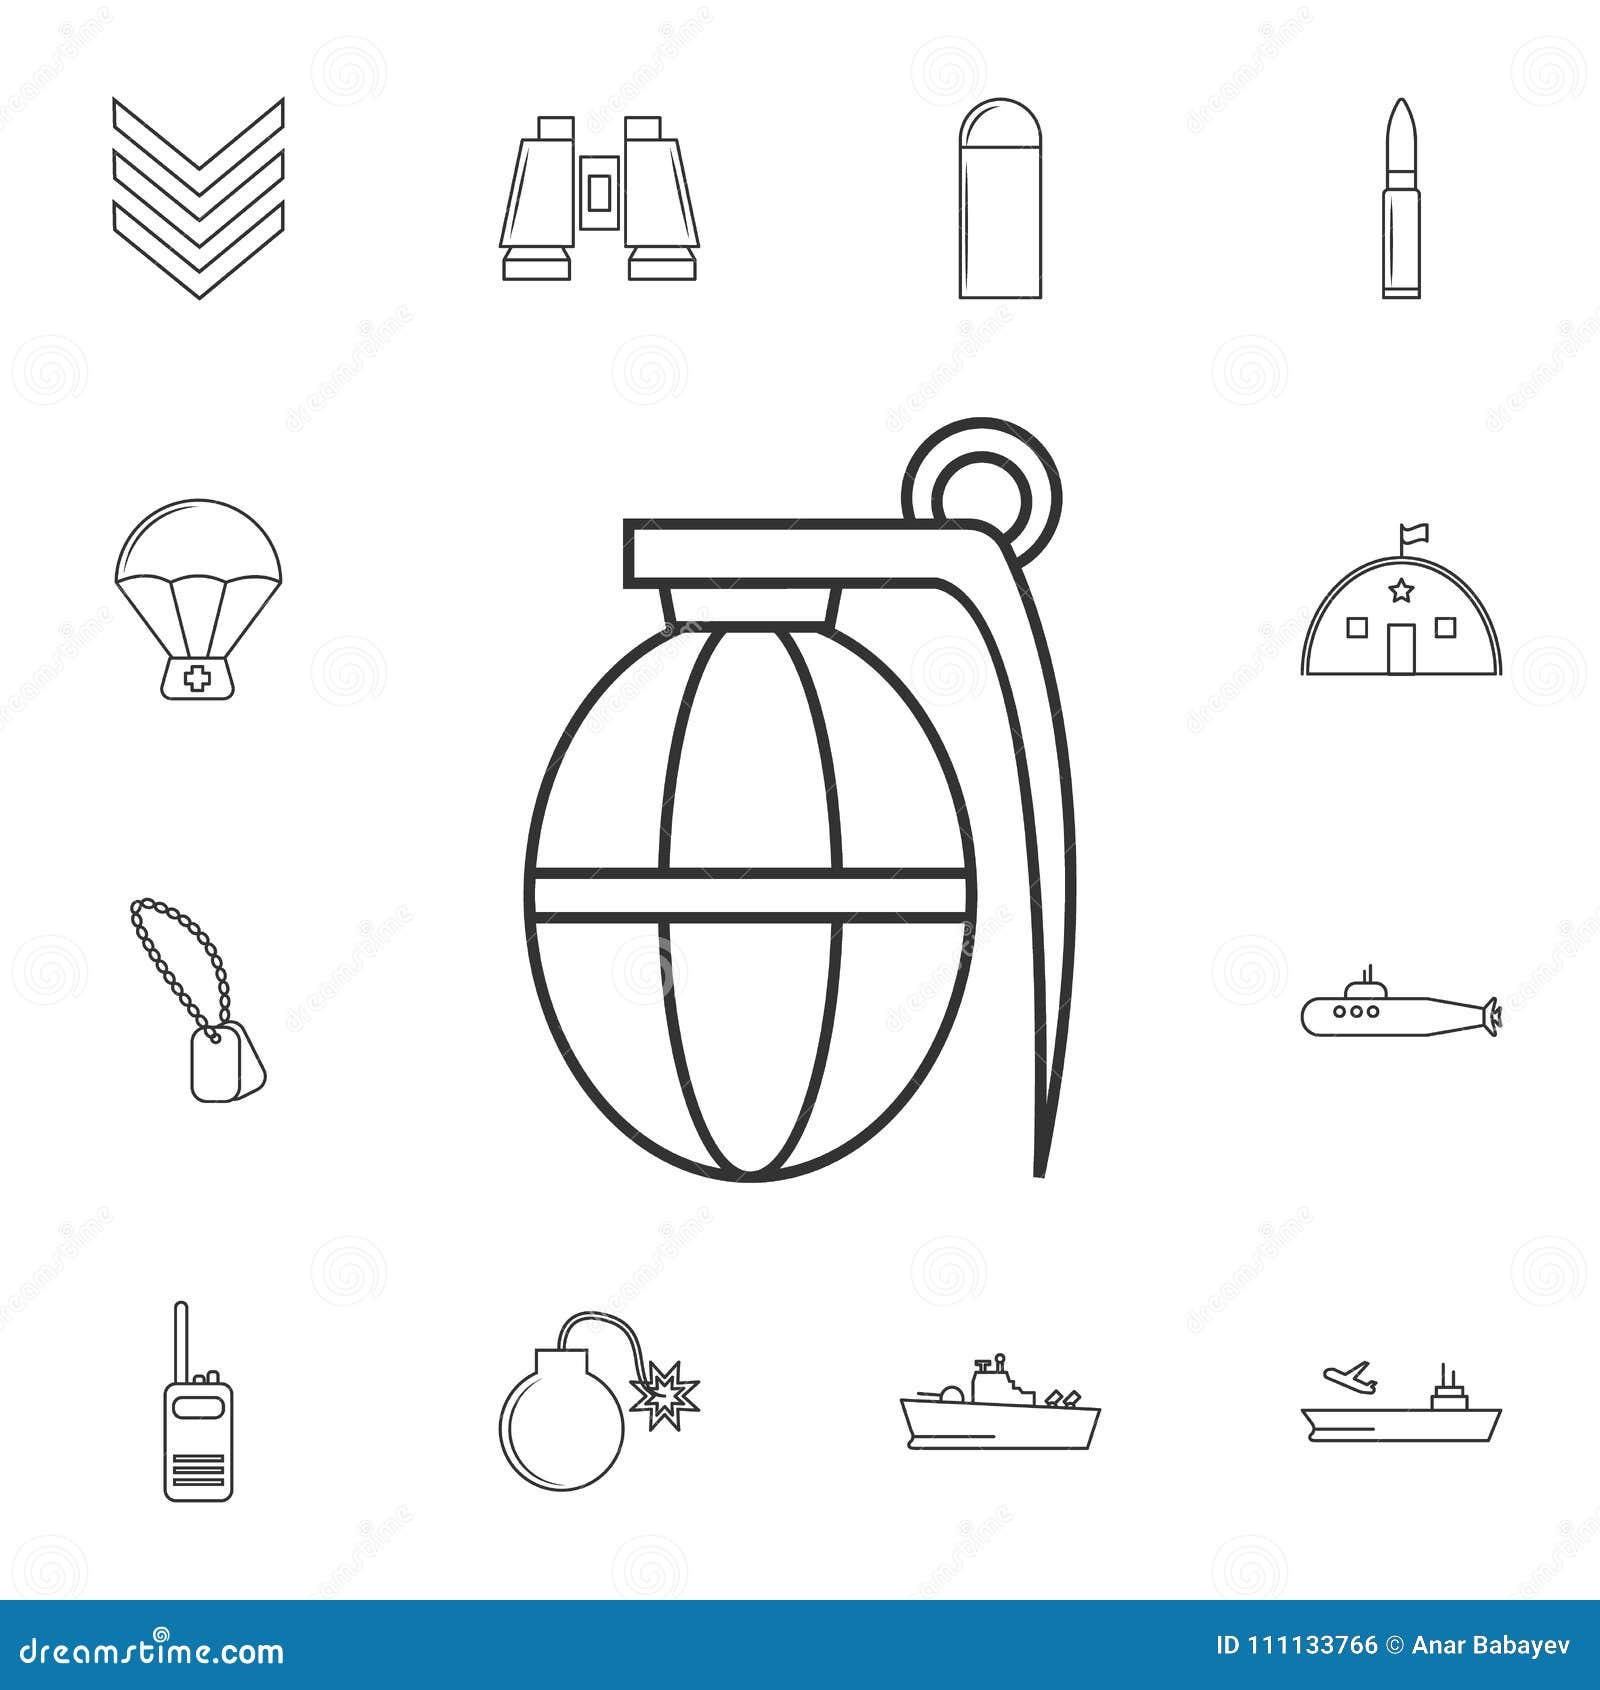 Hand Grenade Line Icon  Element Of Popular Army Icon  Premium